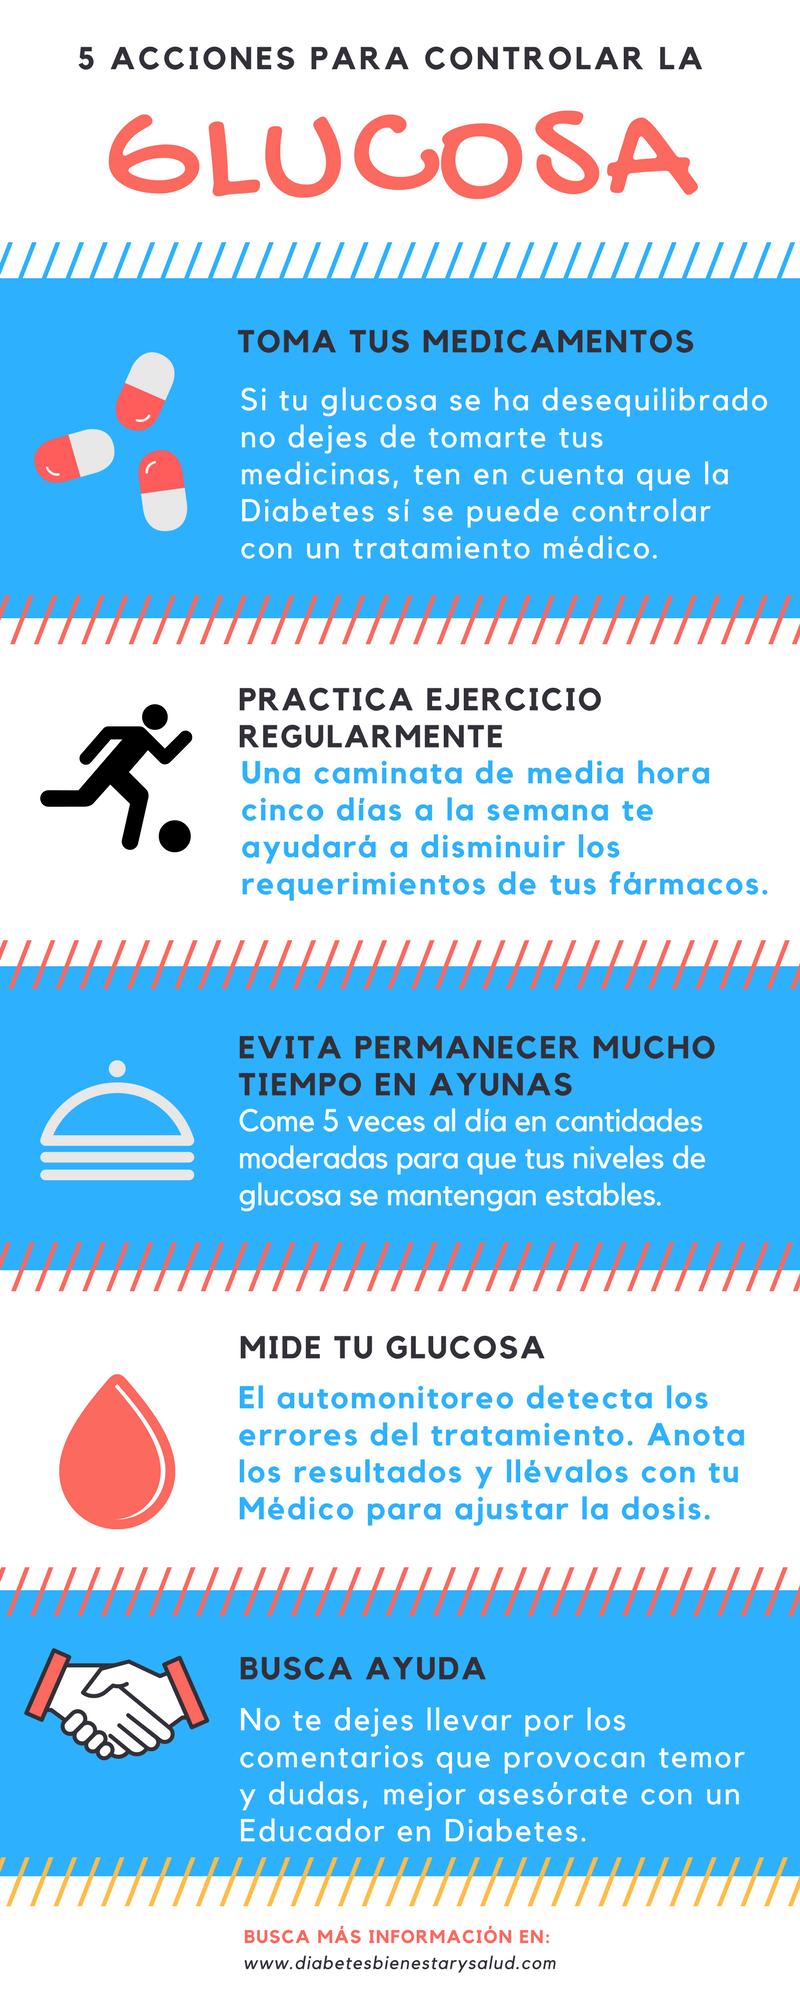 niveles de azucar en la sangre para diagnosticar diabetes